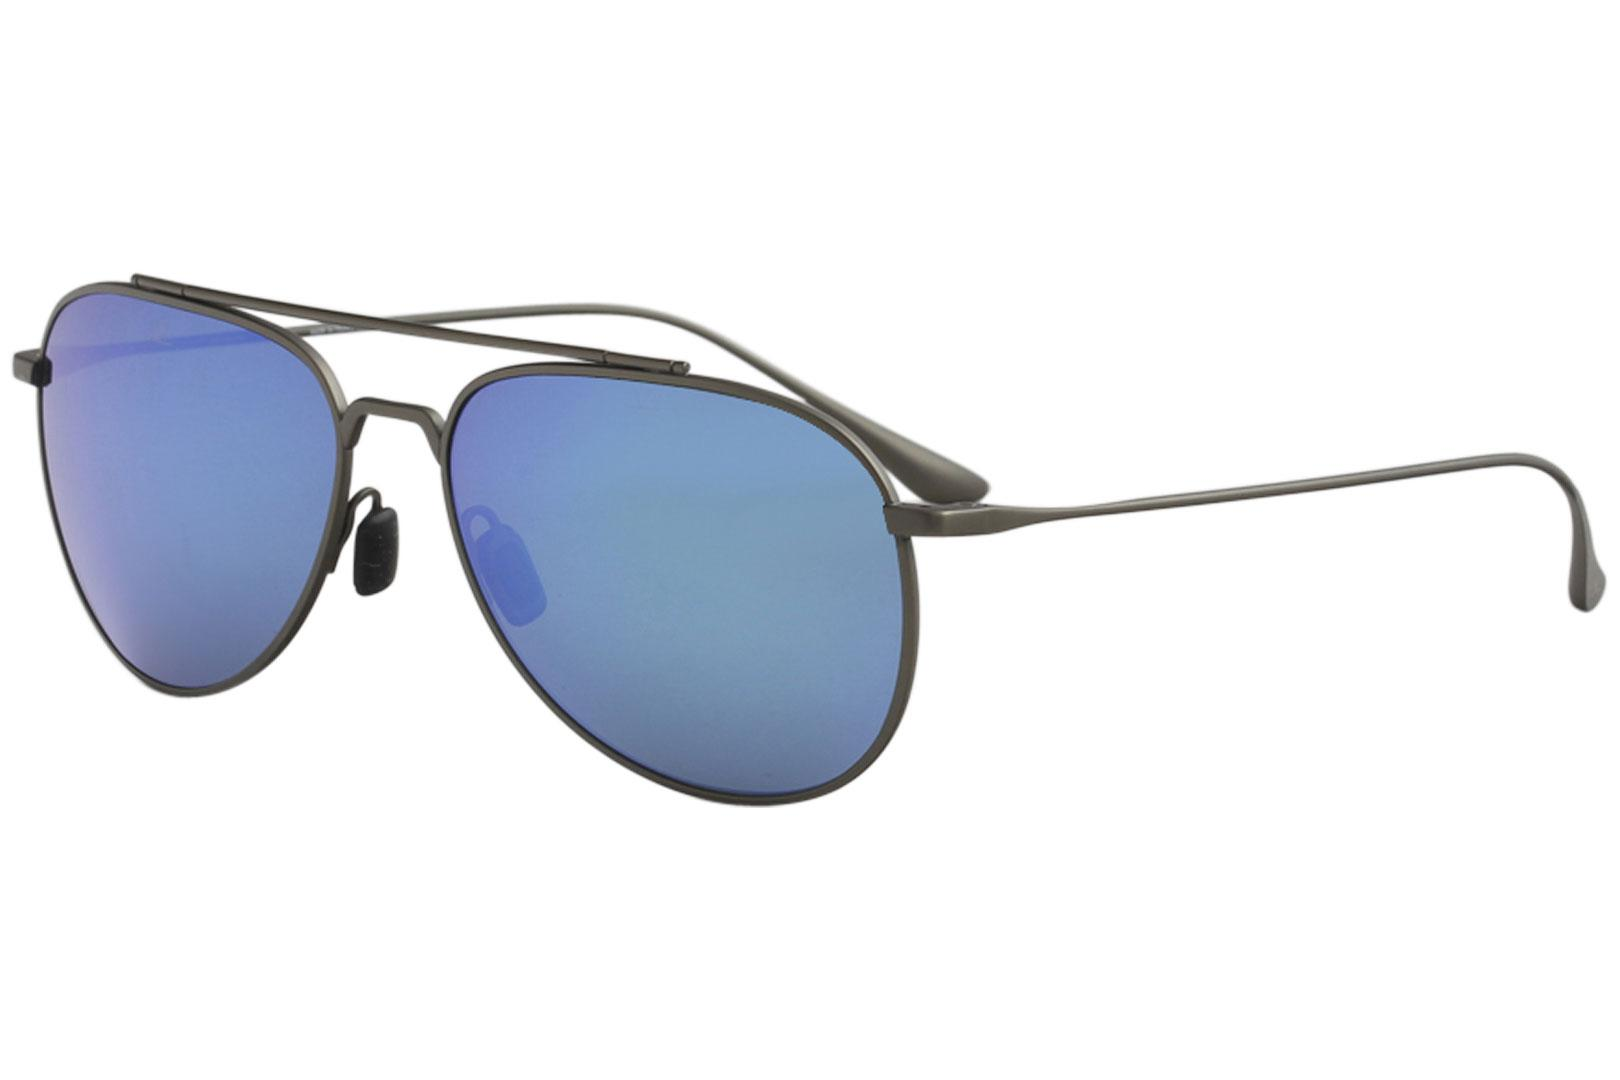 561a1ec031 Vuarnet Men s Swing Pilot VL1627 VL 1627 Titanium Fashion Sunglasses by  Vuarnet. Touch to zoom